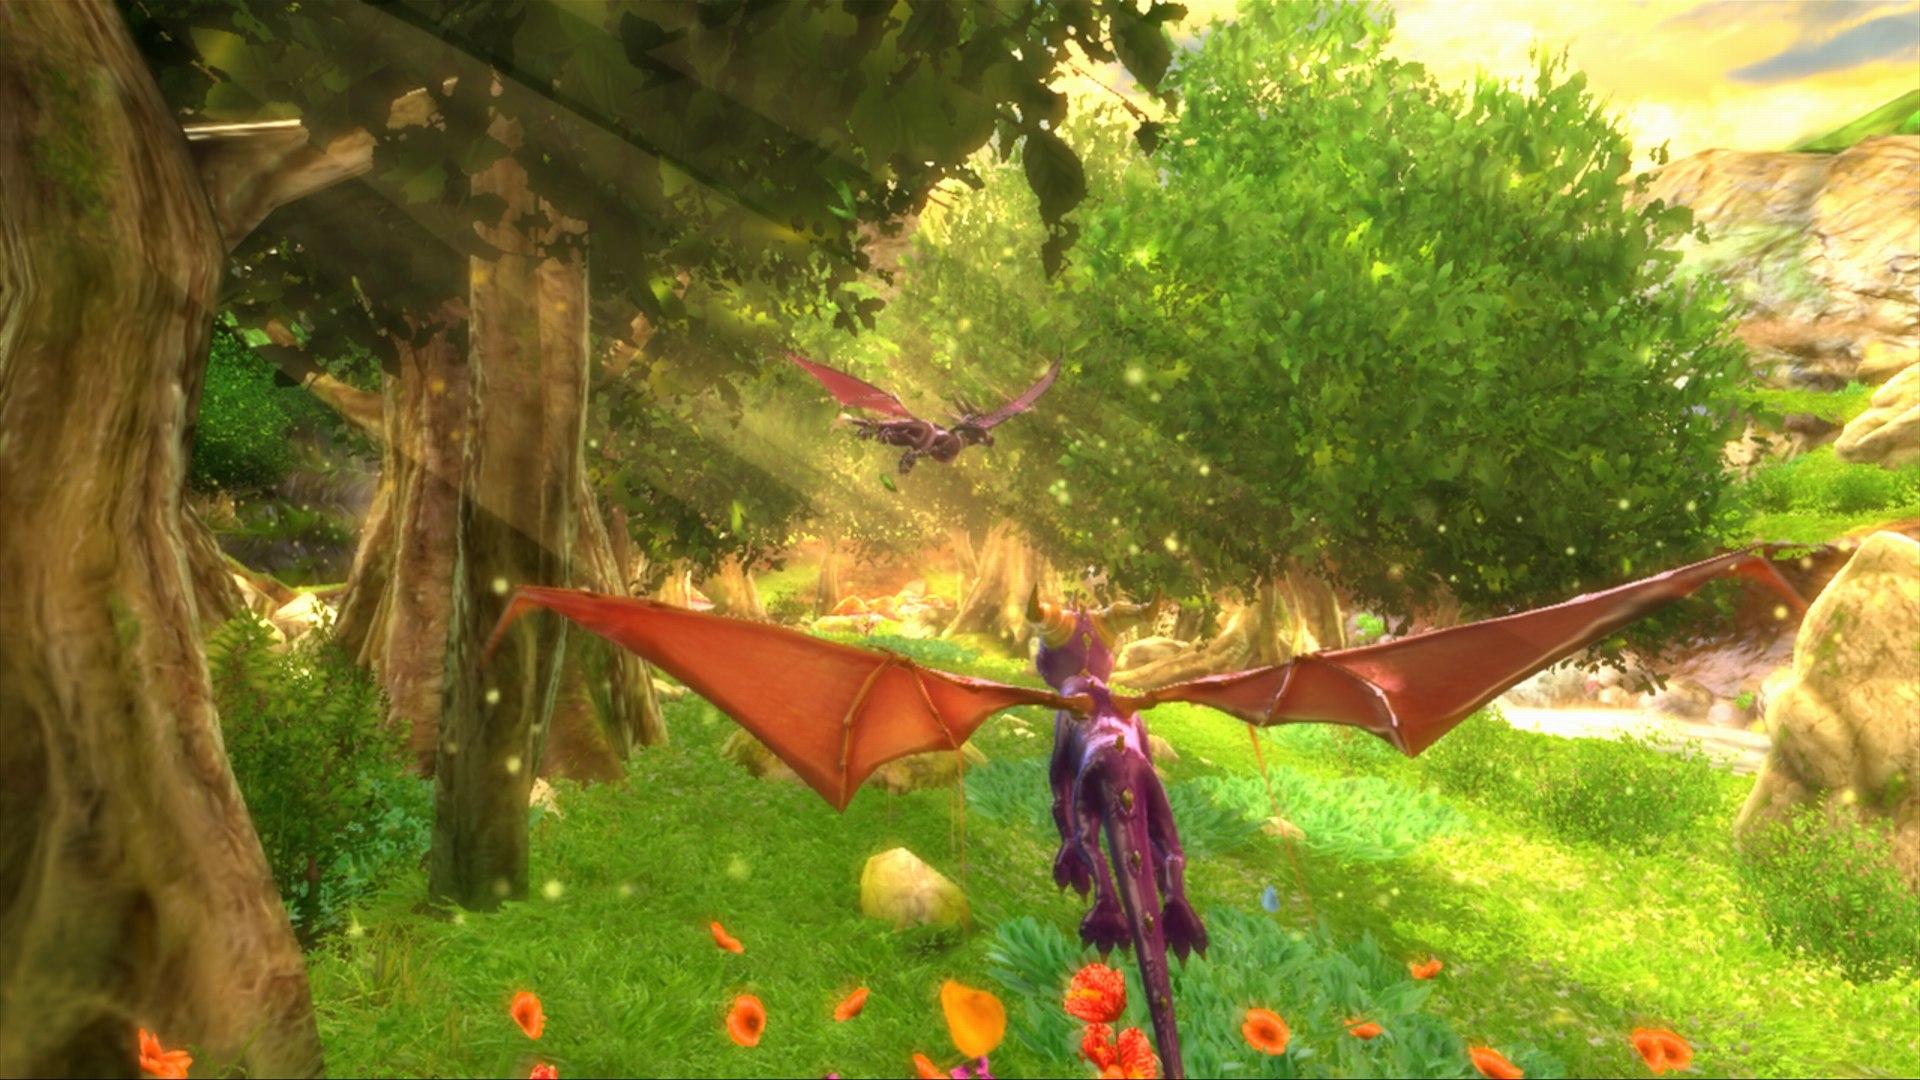 Spyro and cynder hd wallpaper background image - Spyro wallpaper ...